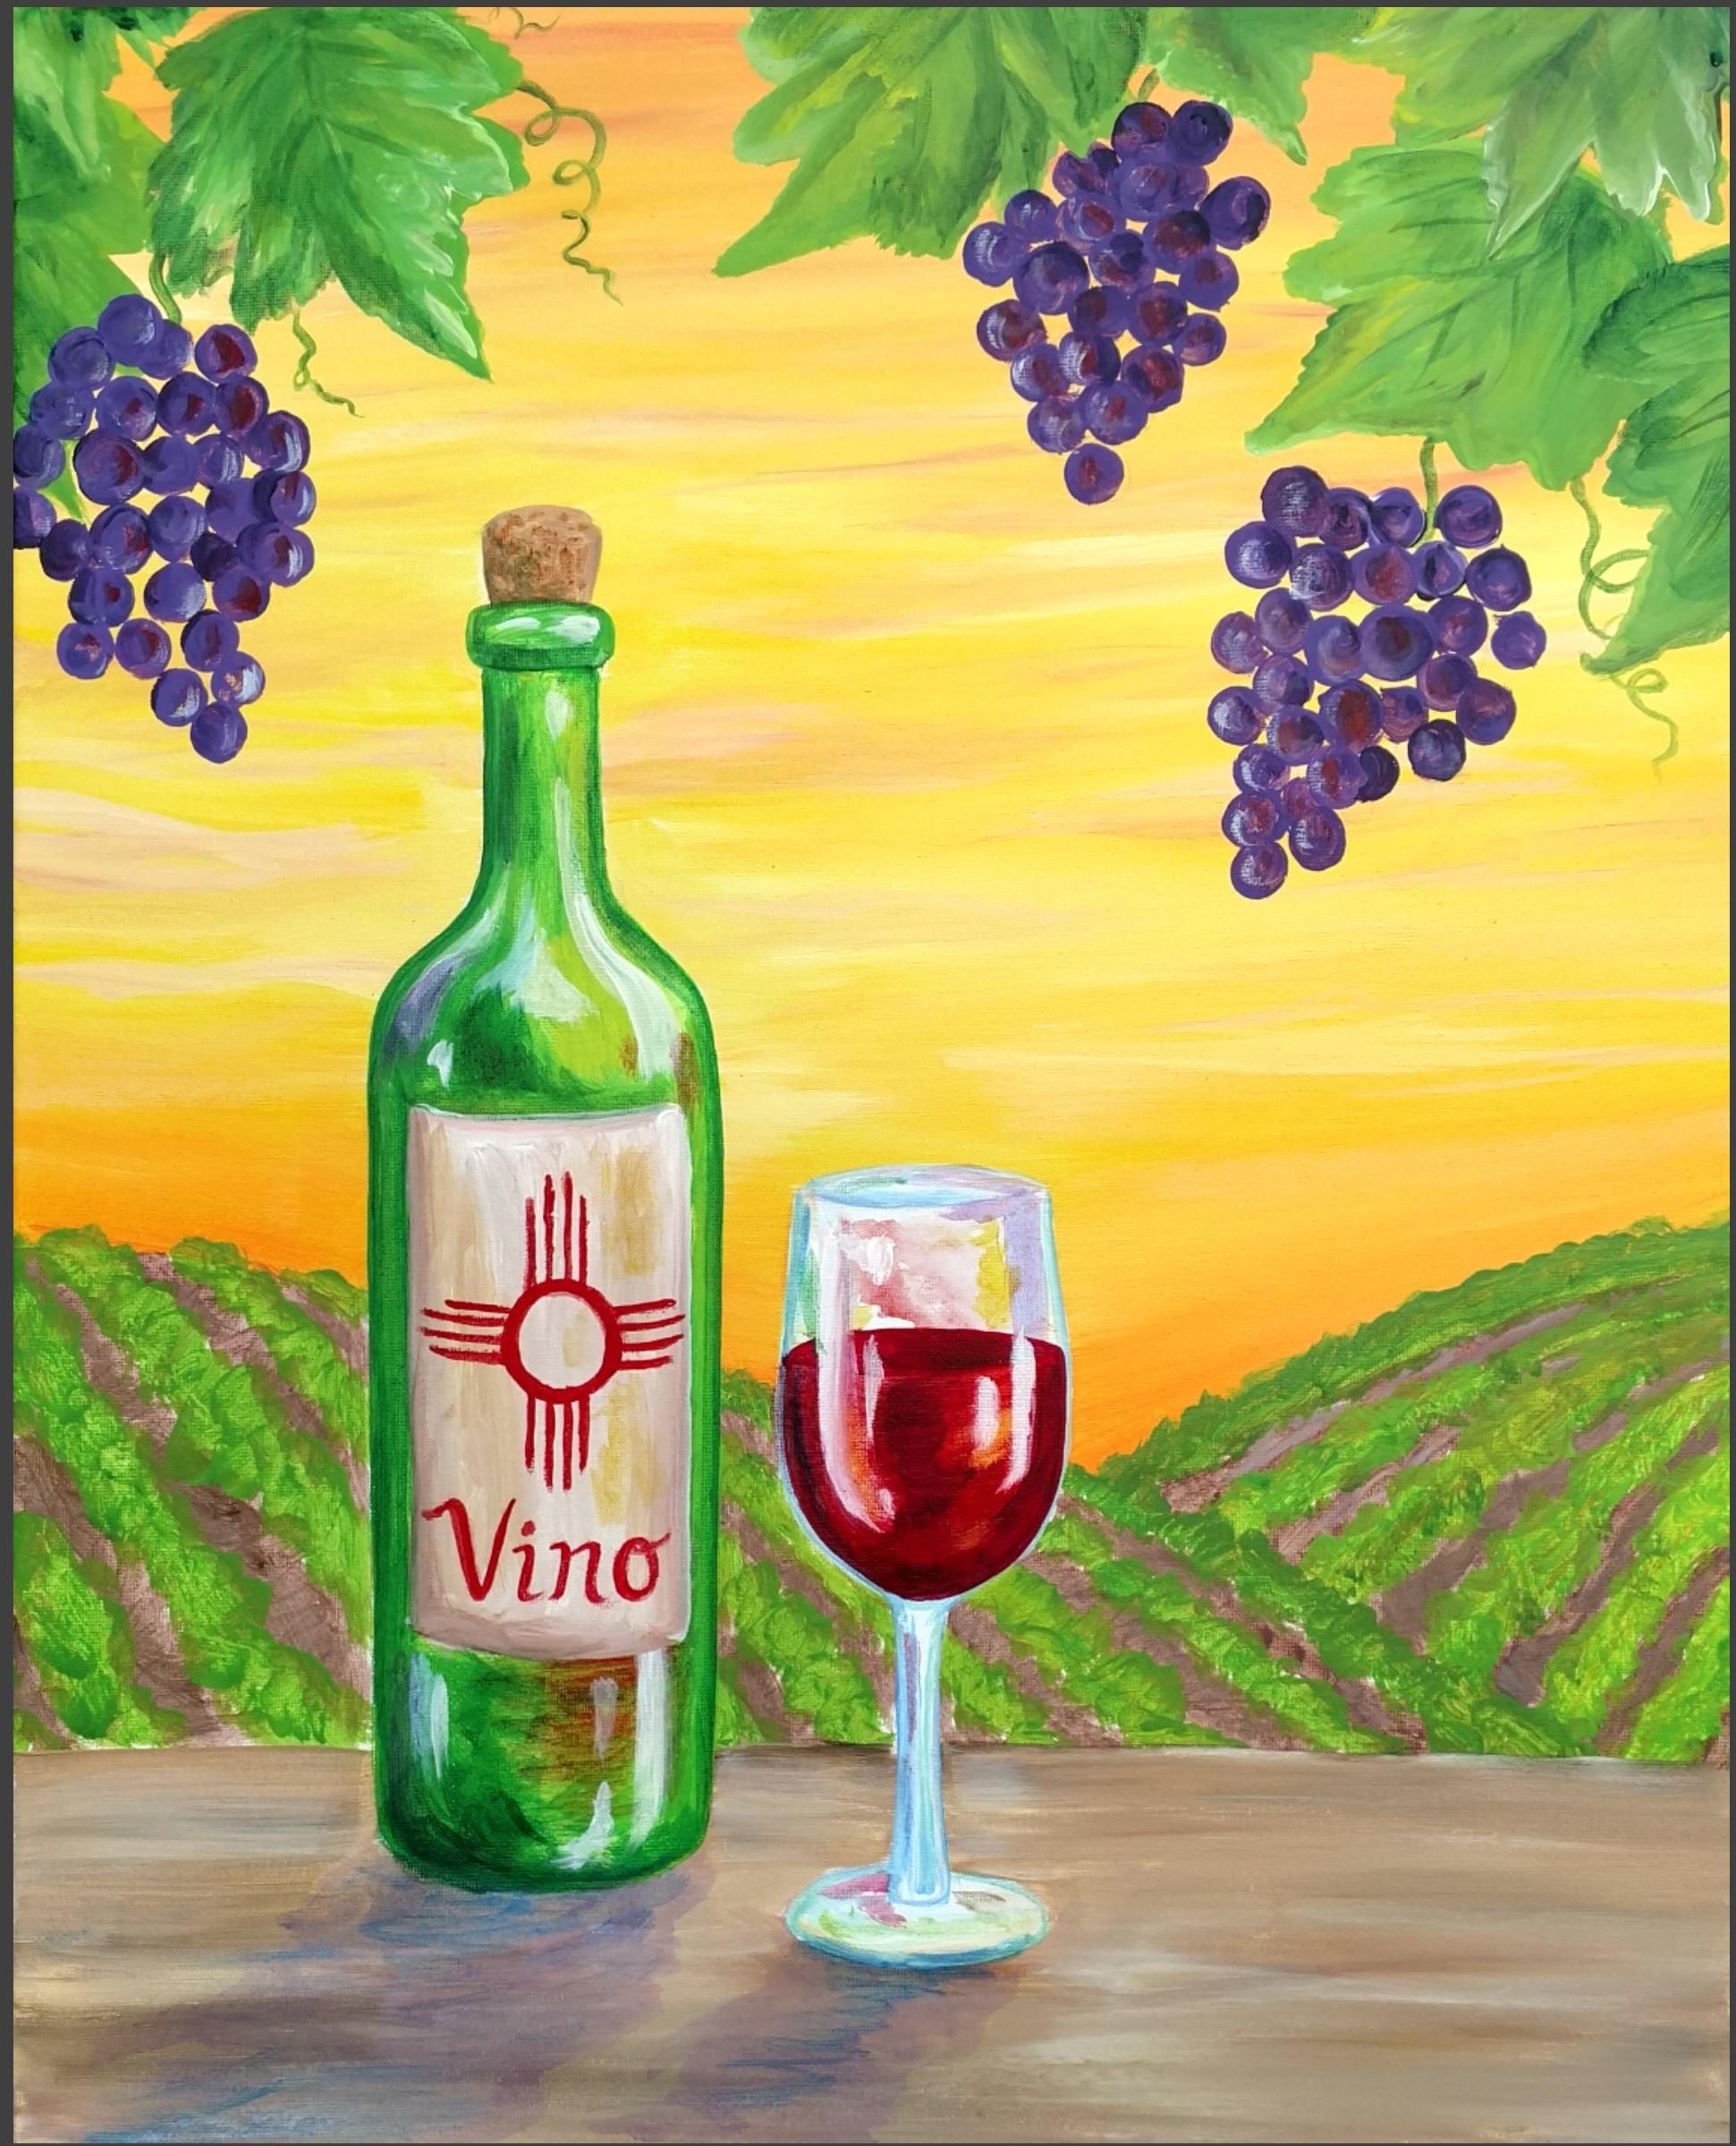 Eventbrite, Adult Paint Party: Summer Vineyard